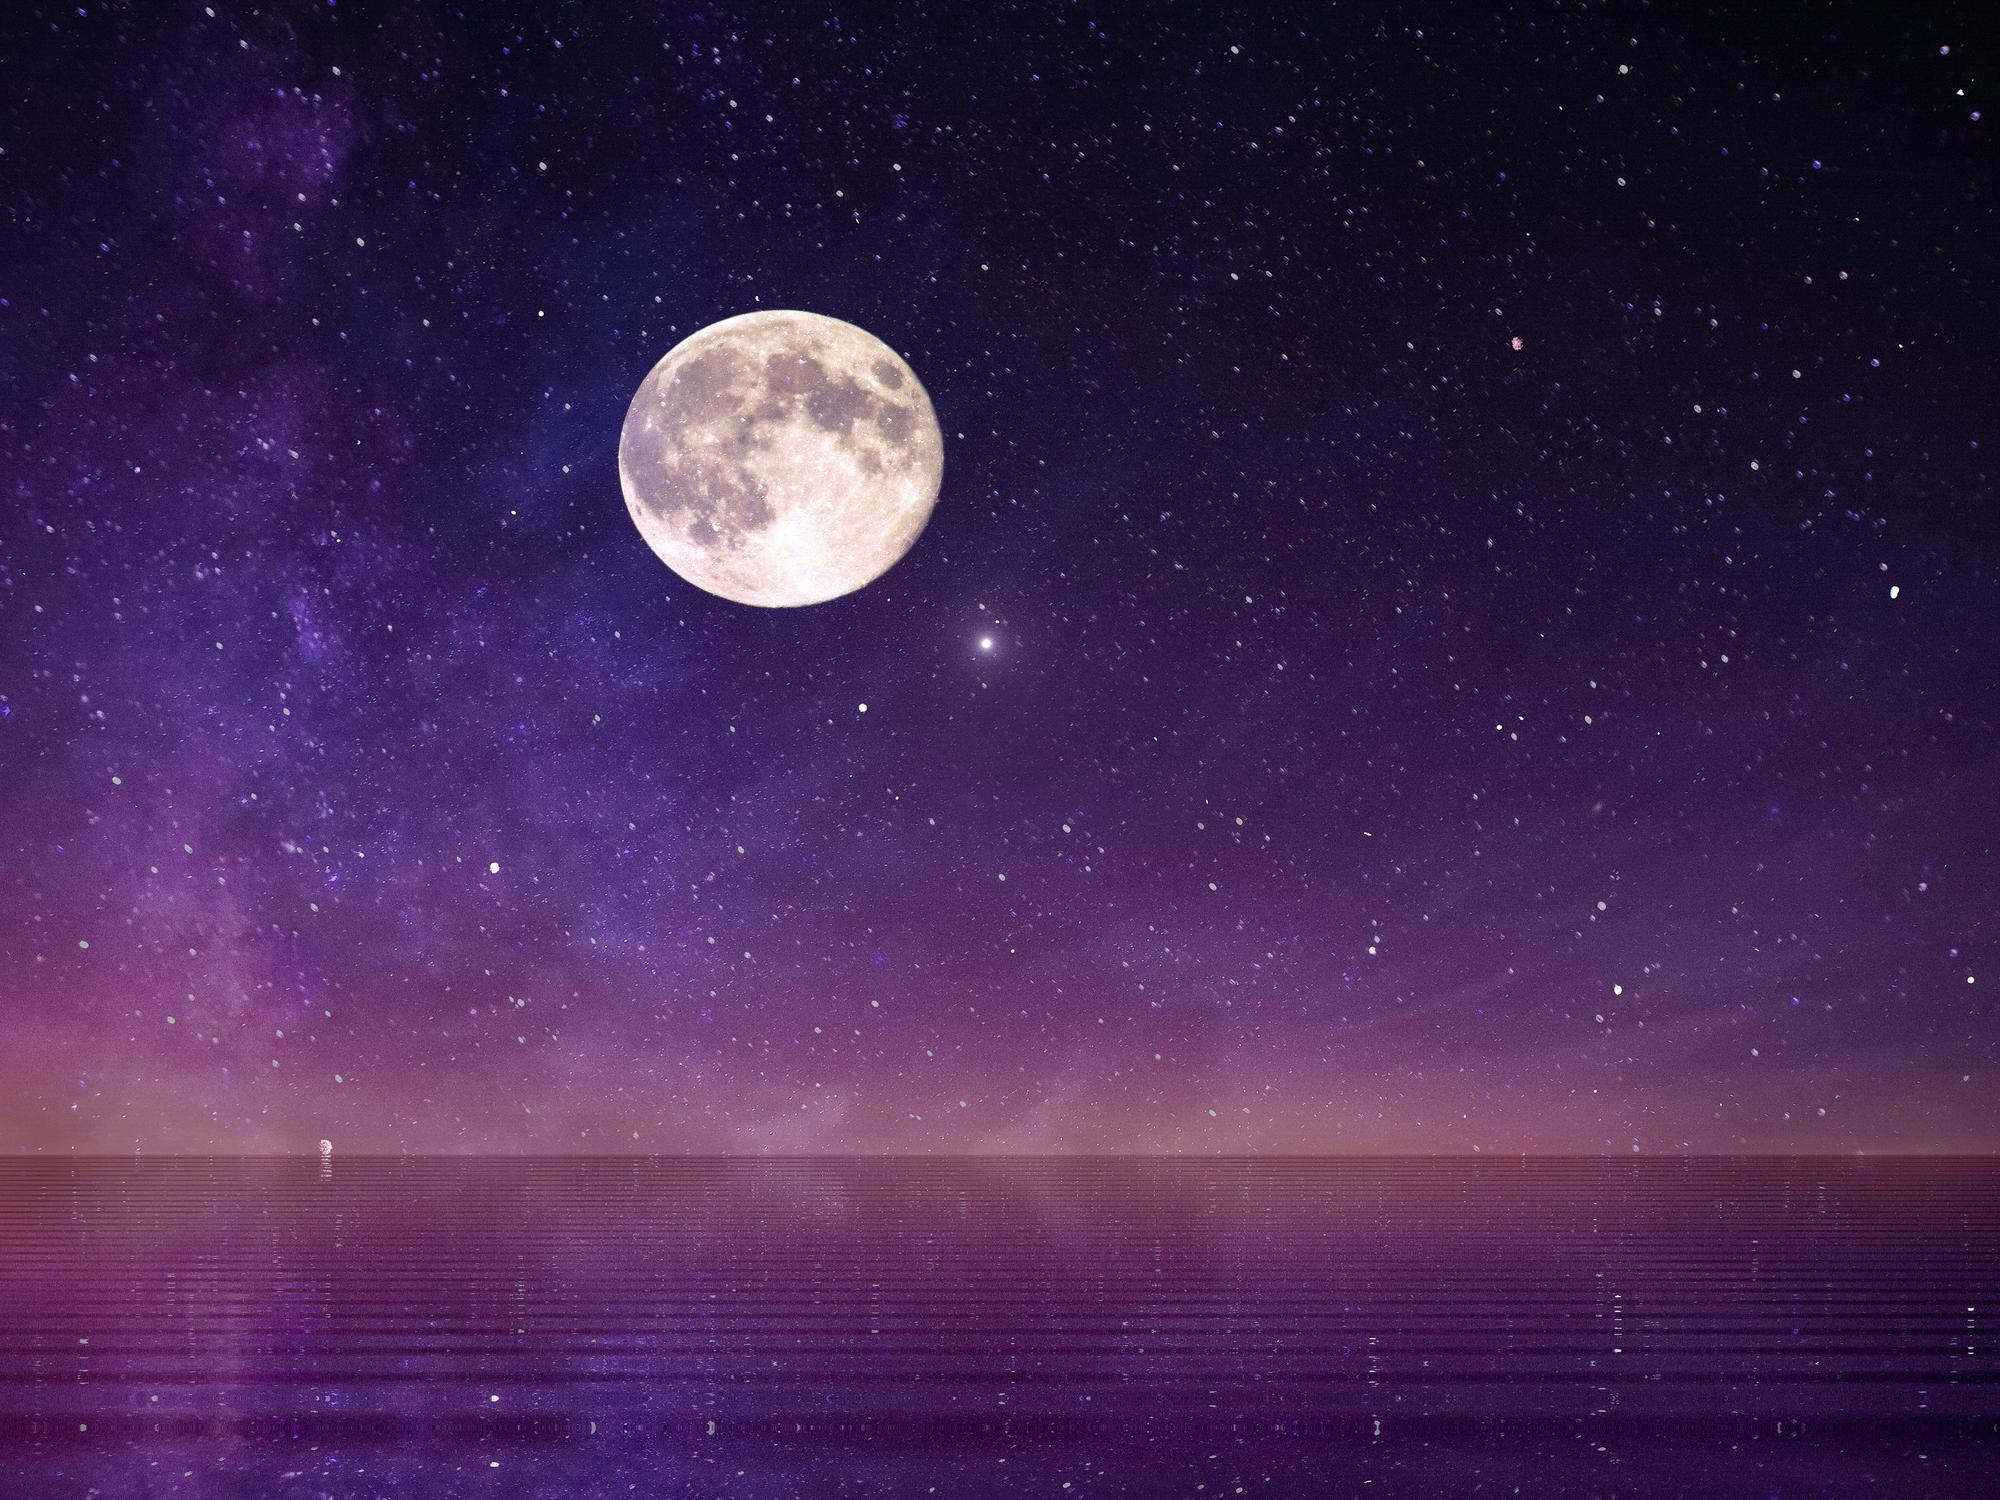 Volle maan 30 december 2020 ♥ Petra Stam ♥ Lichtwerkers Nederland